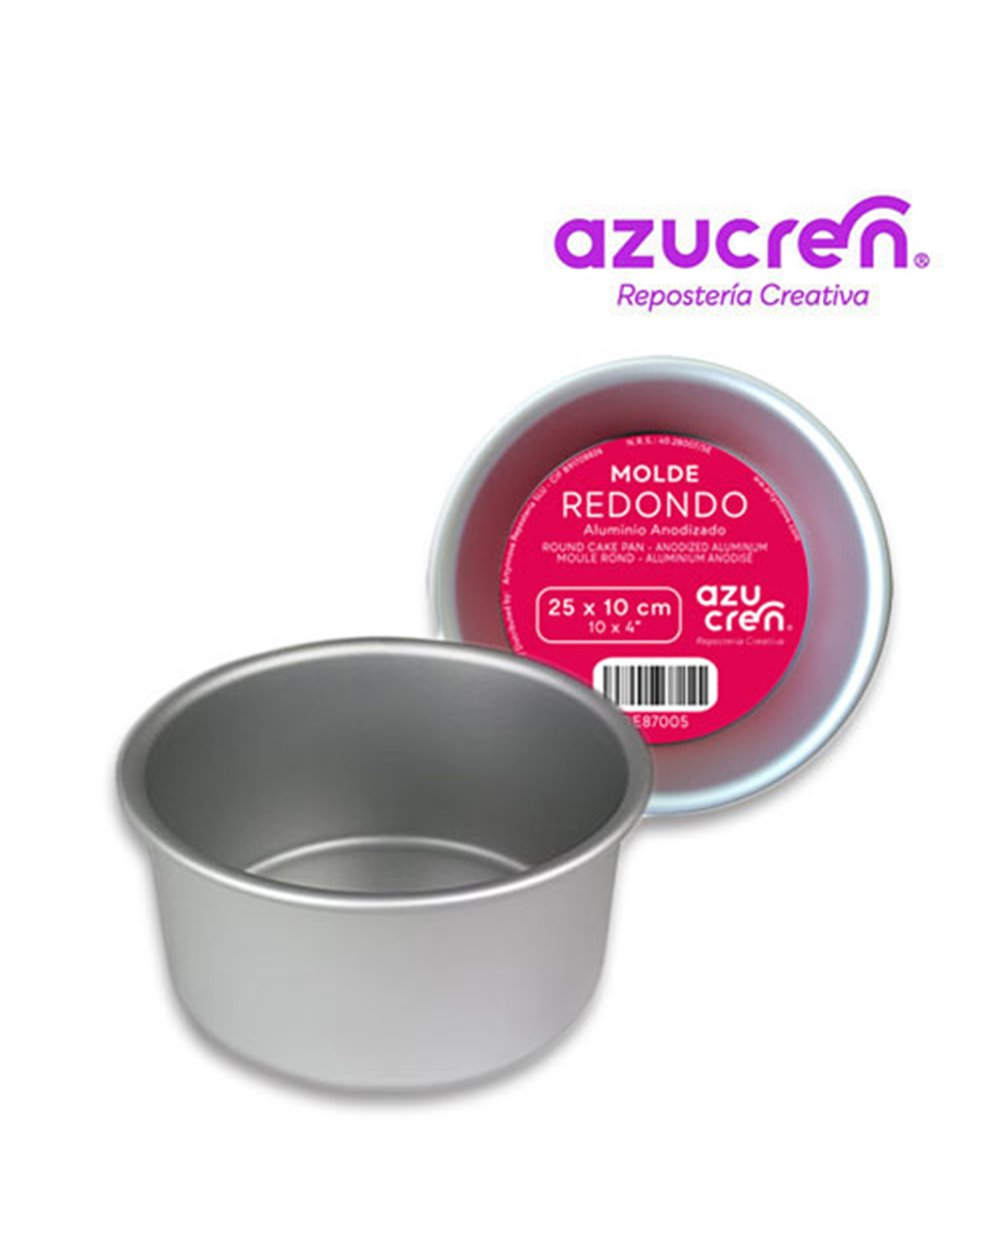 Azucren molde redondo 25x10cm+